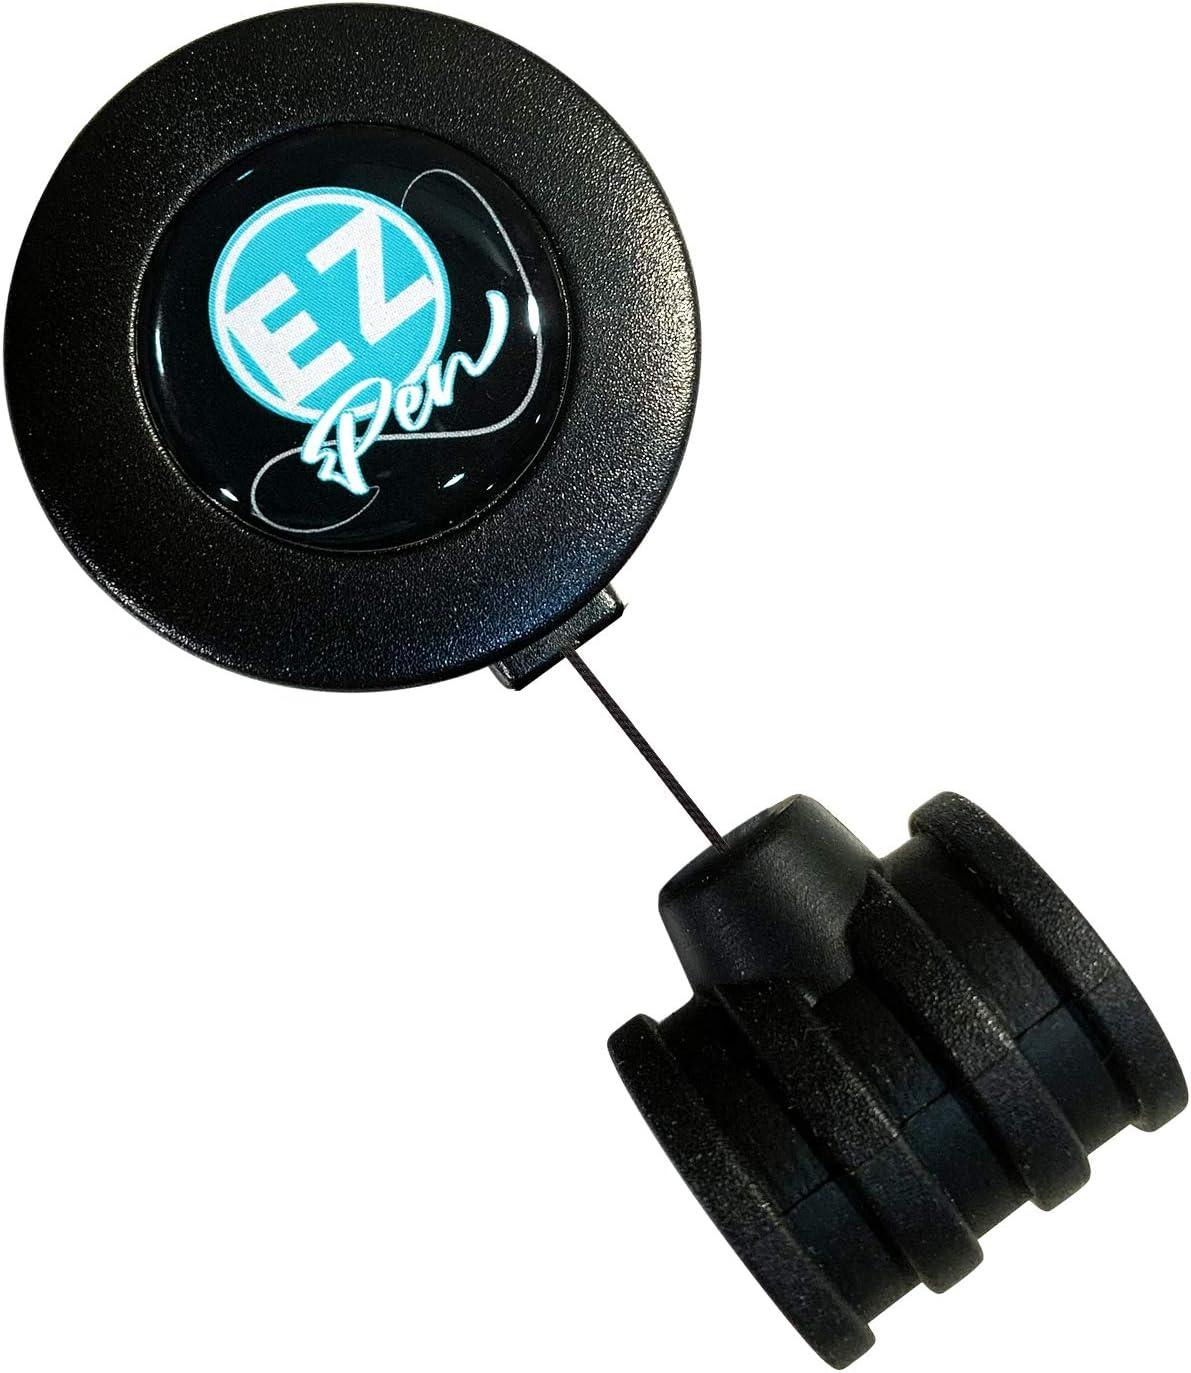 EZ Sale Special Max 75% OFF Price PEN Retractable Pen Reel Ca for Teachers Nurses Waitresses